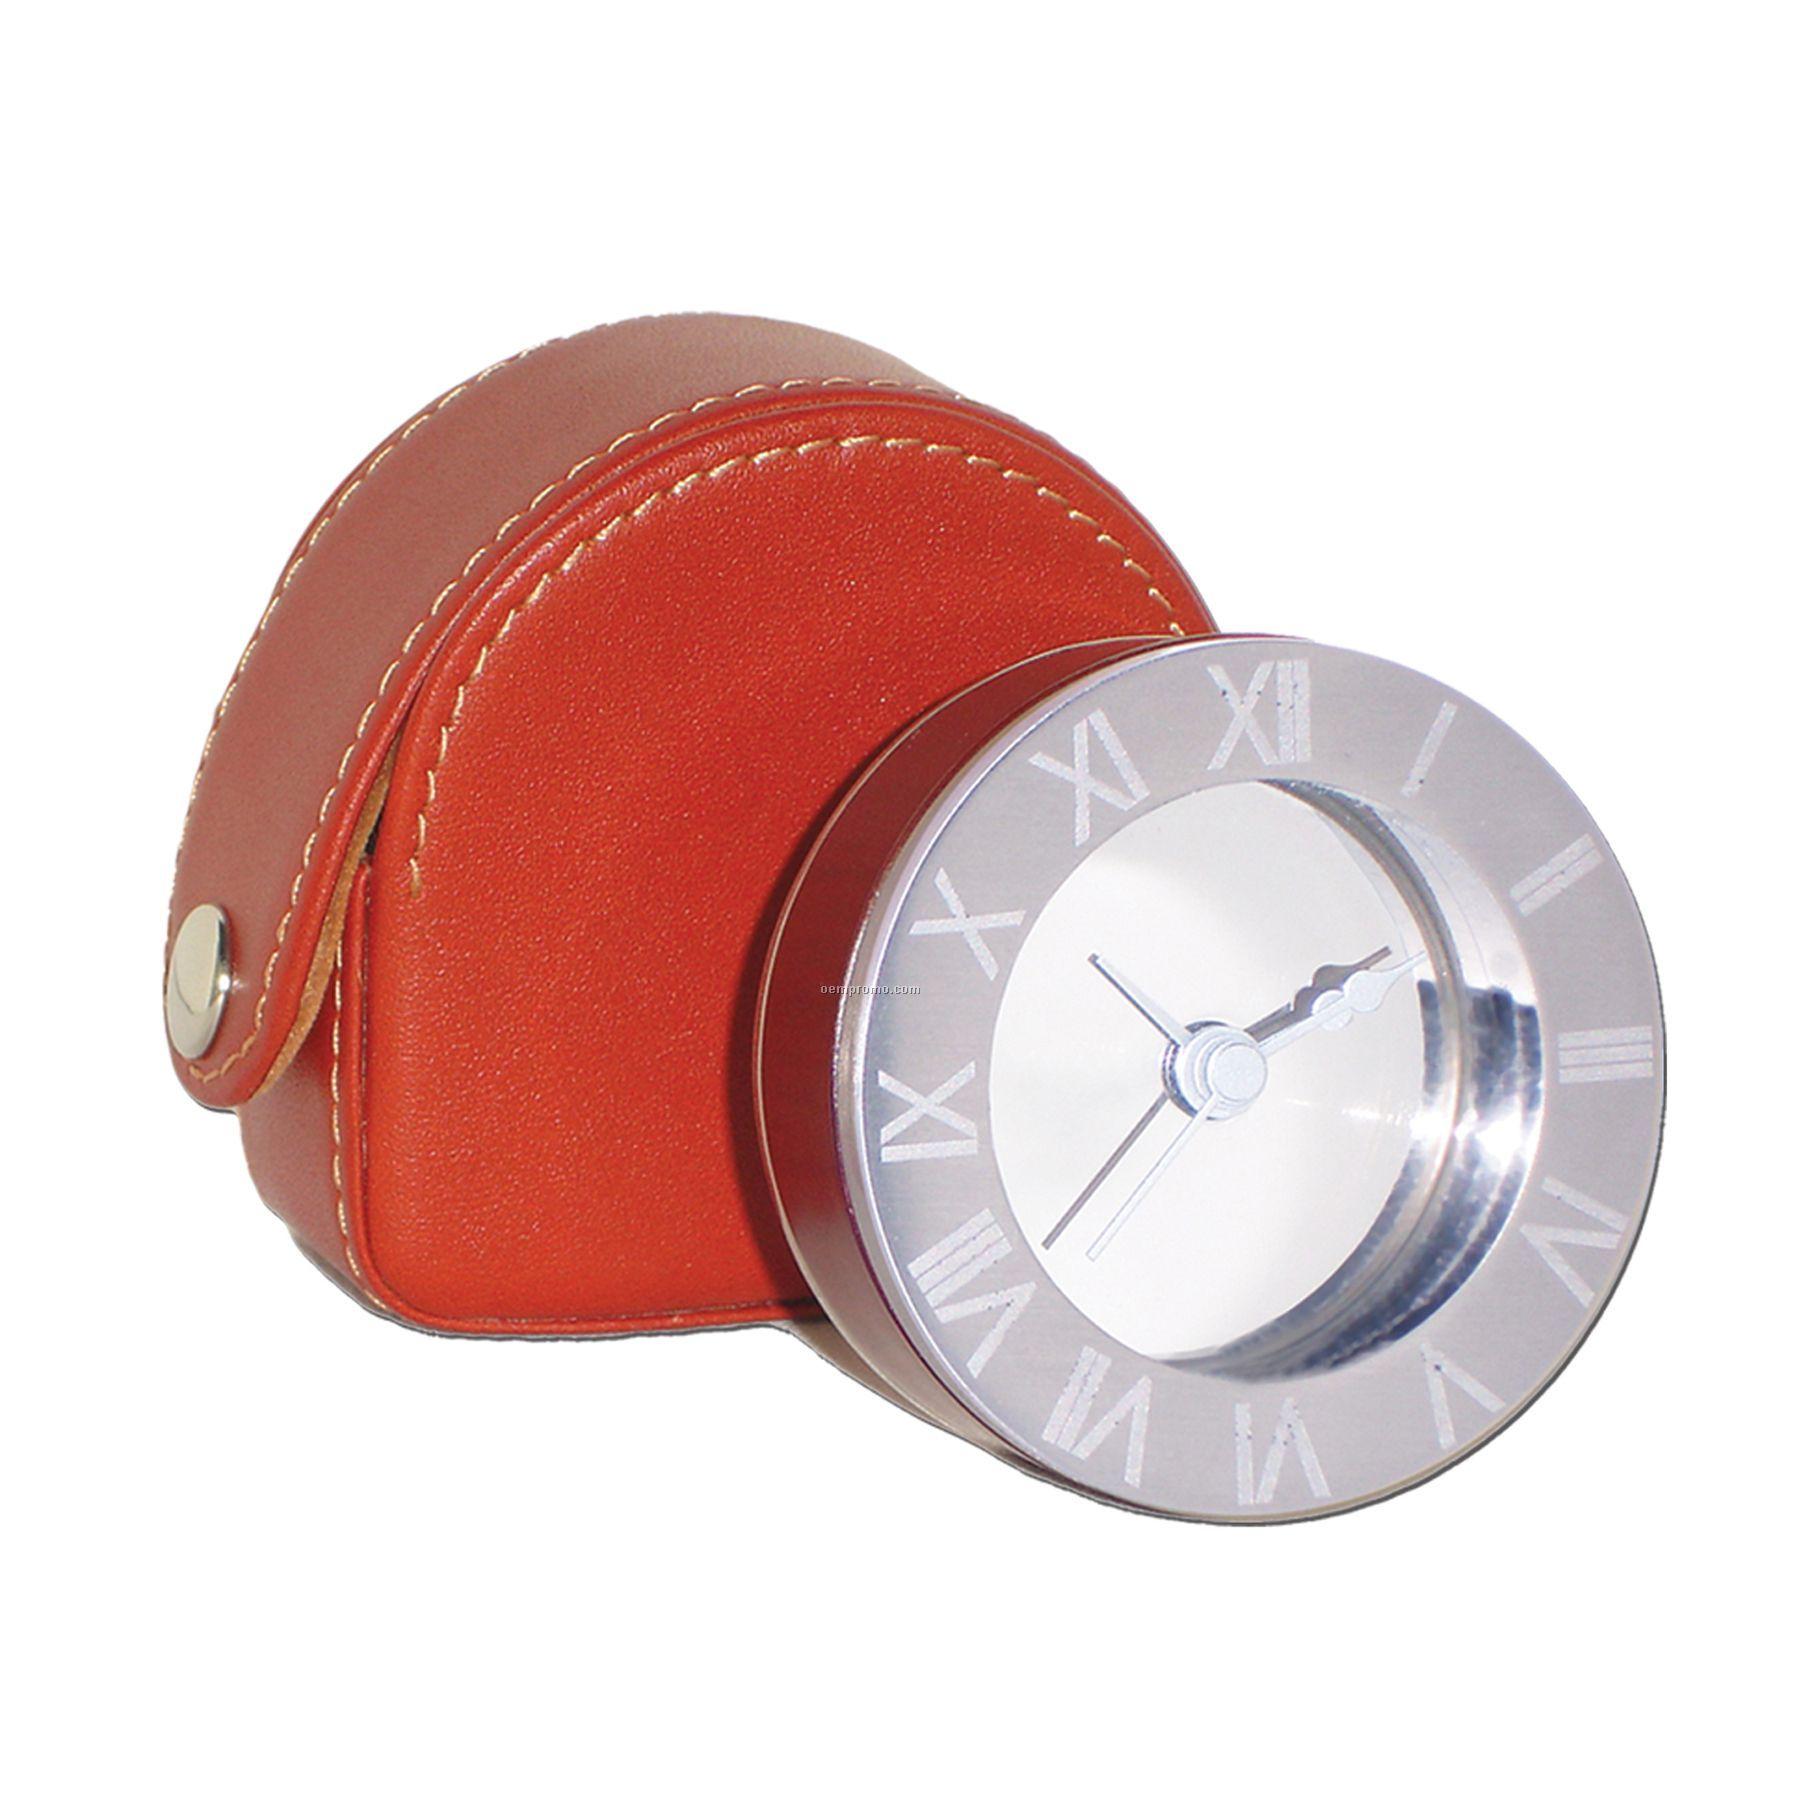 Metal & Wood Alarm Clock W/ Leather Case